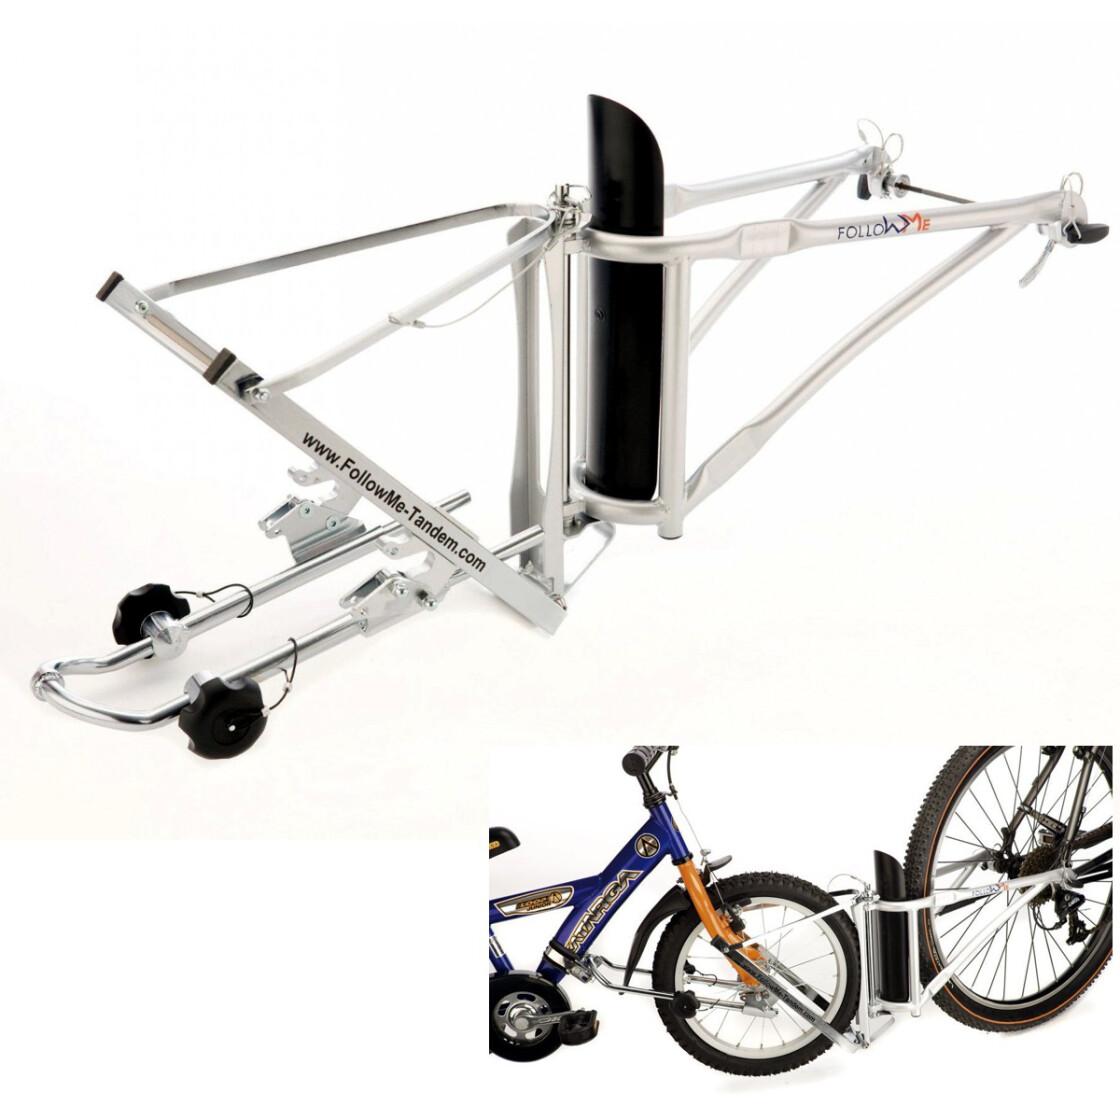 followme tandemkupplung typ a preisvergleich fahrrad. Black Bedroom Furniture Sets. Home Design Ideas